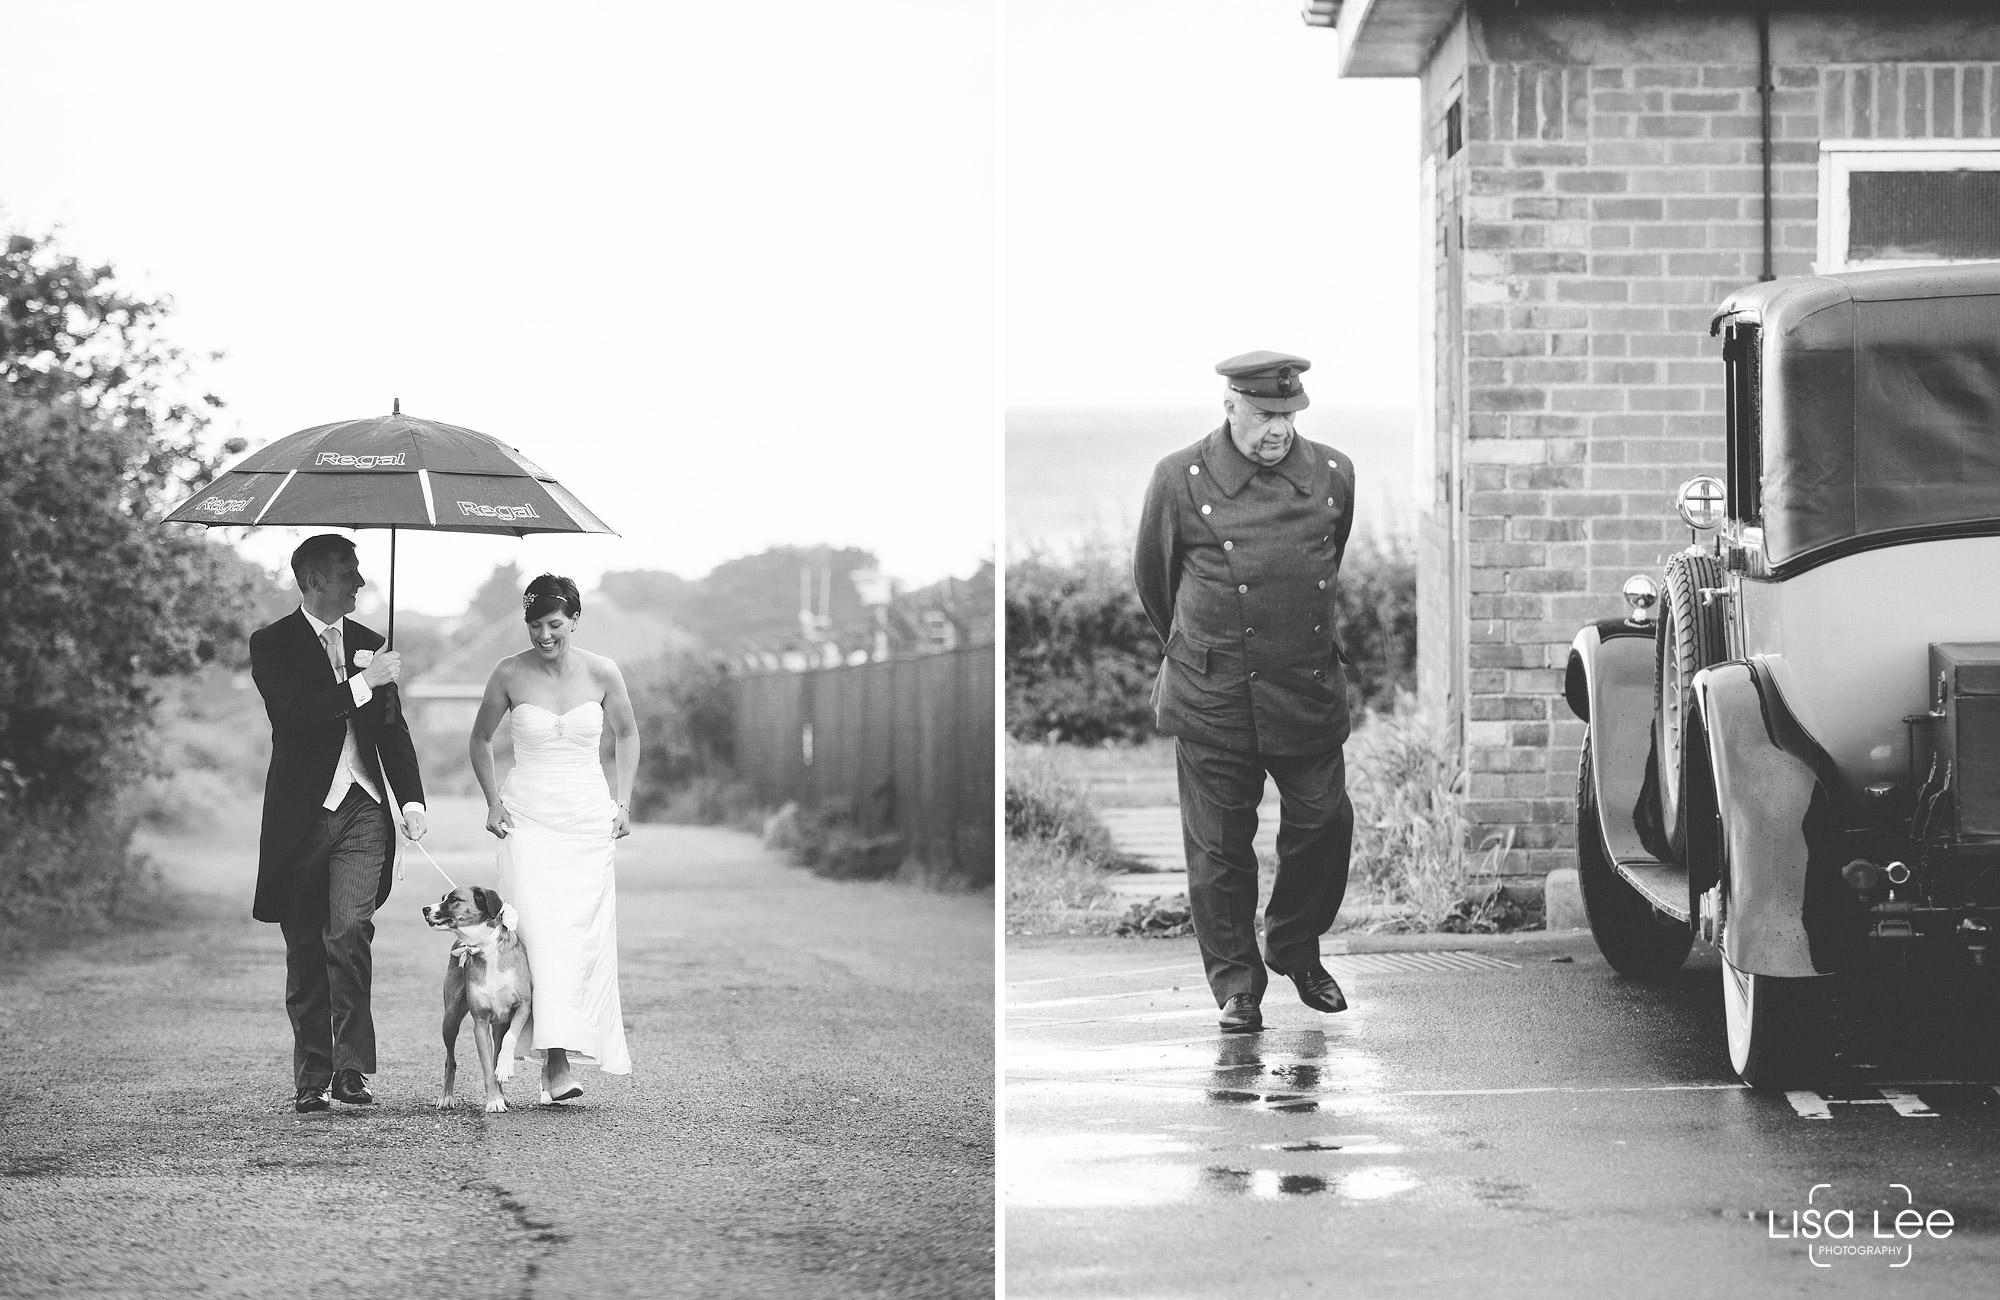 lisa-lee-wedding-photography-burton-steamerpoint.jpg